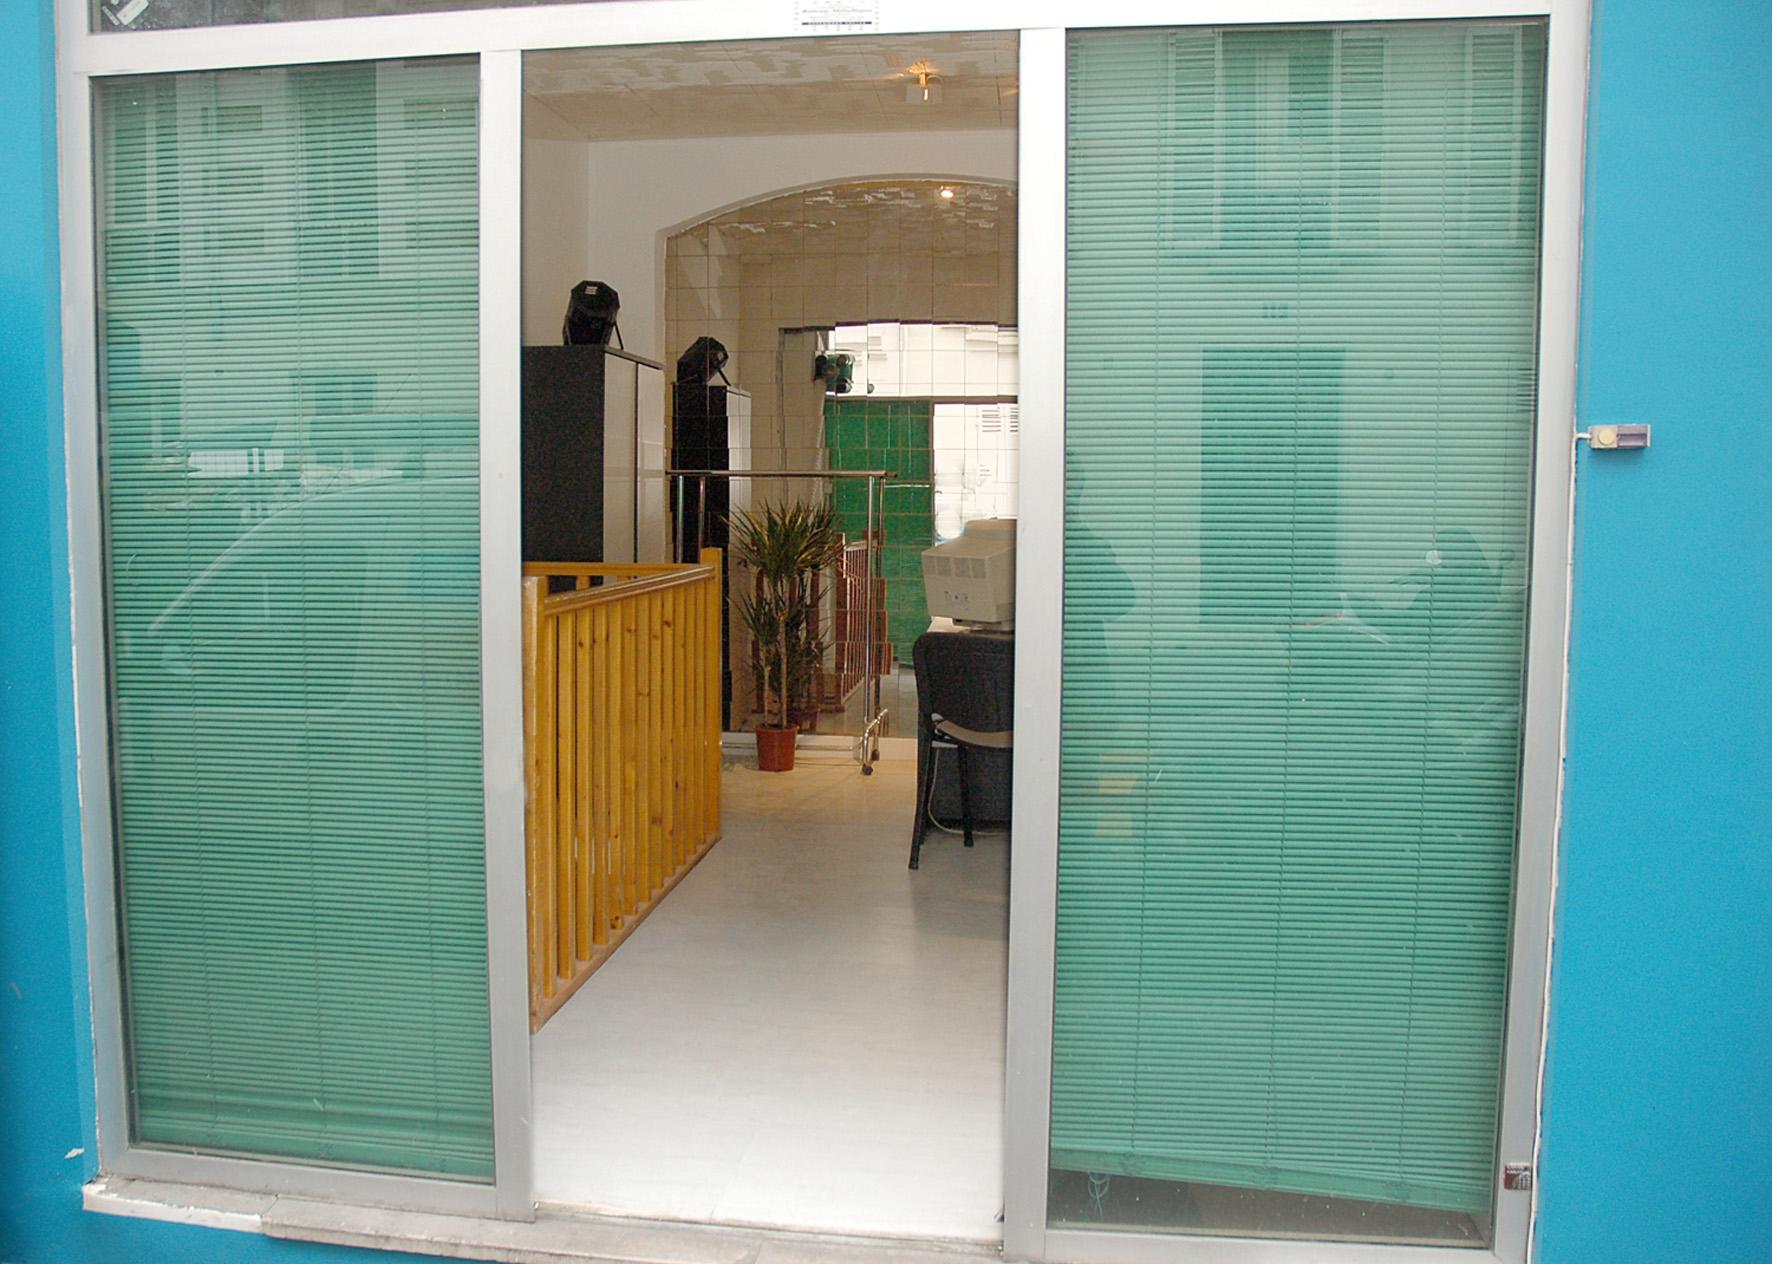 a vendre studio d 39 enregistrement paris 17. Black Bedroom Furniture Sets. Home Design Ideas